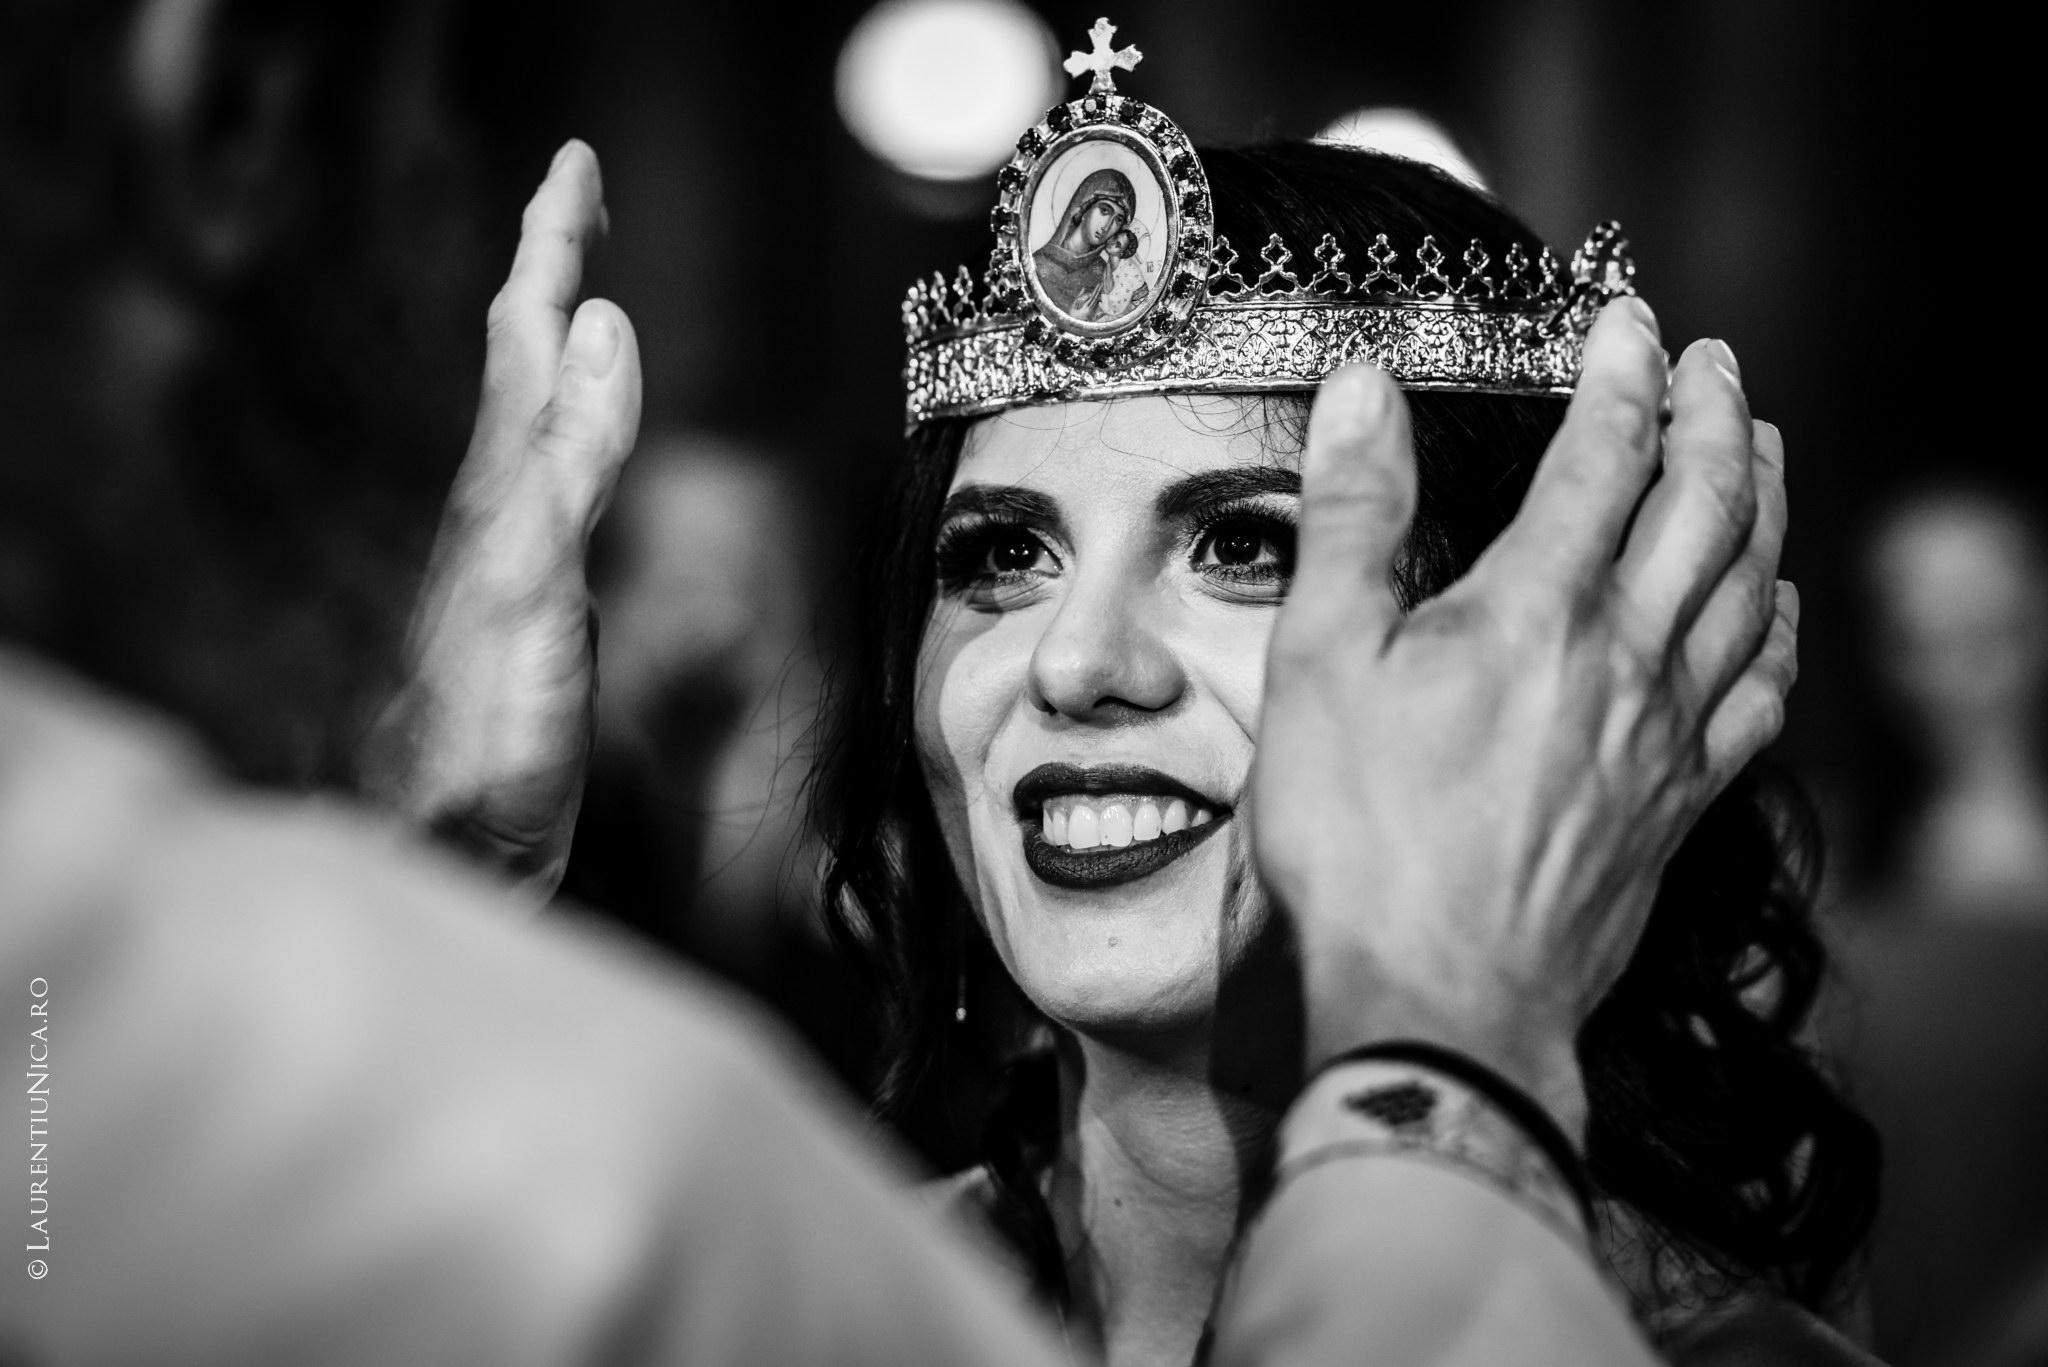 fotografii nunta craiova bia alex fotograf nunta laurentiu nica 37 - Bia & Alex | Fotografii nunta | Craiova